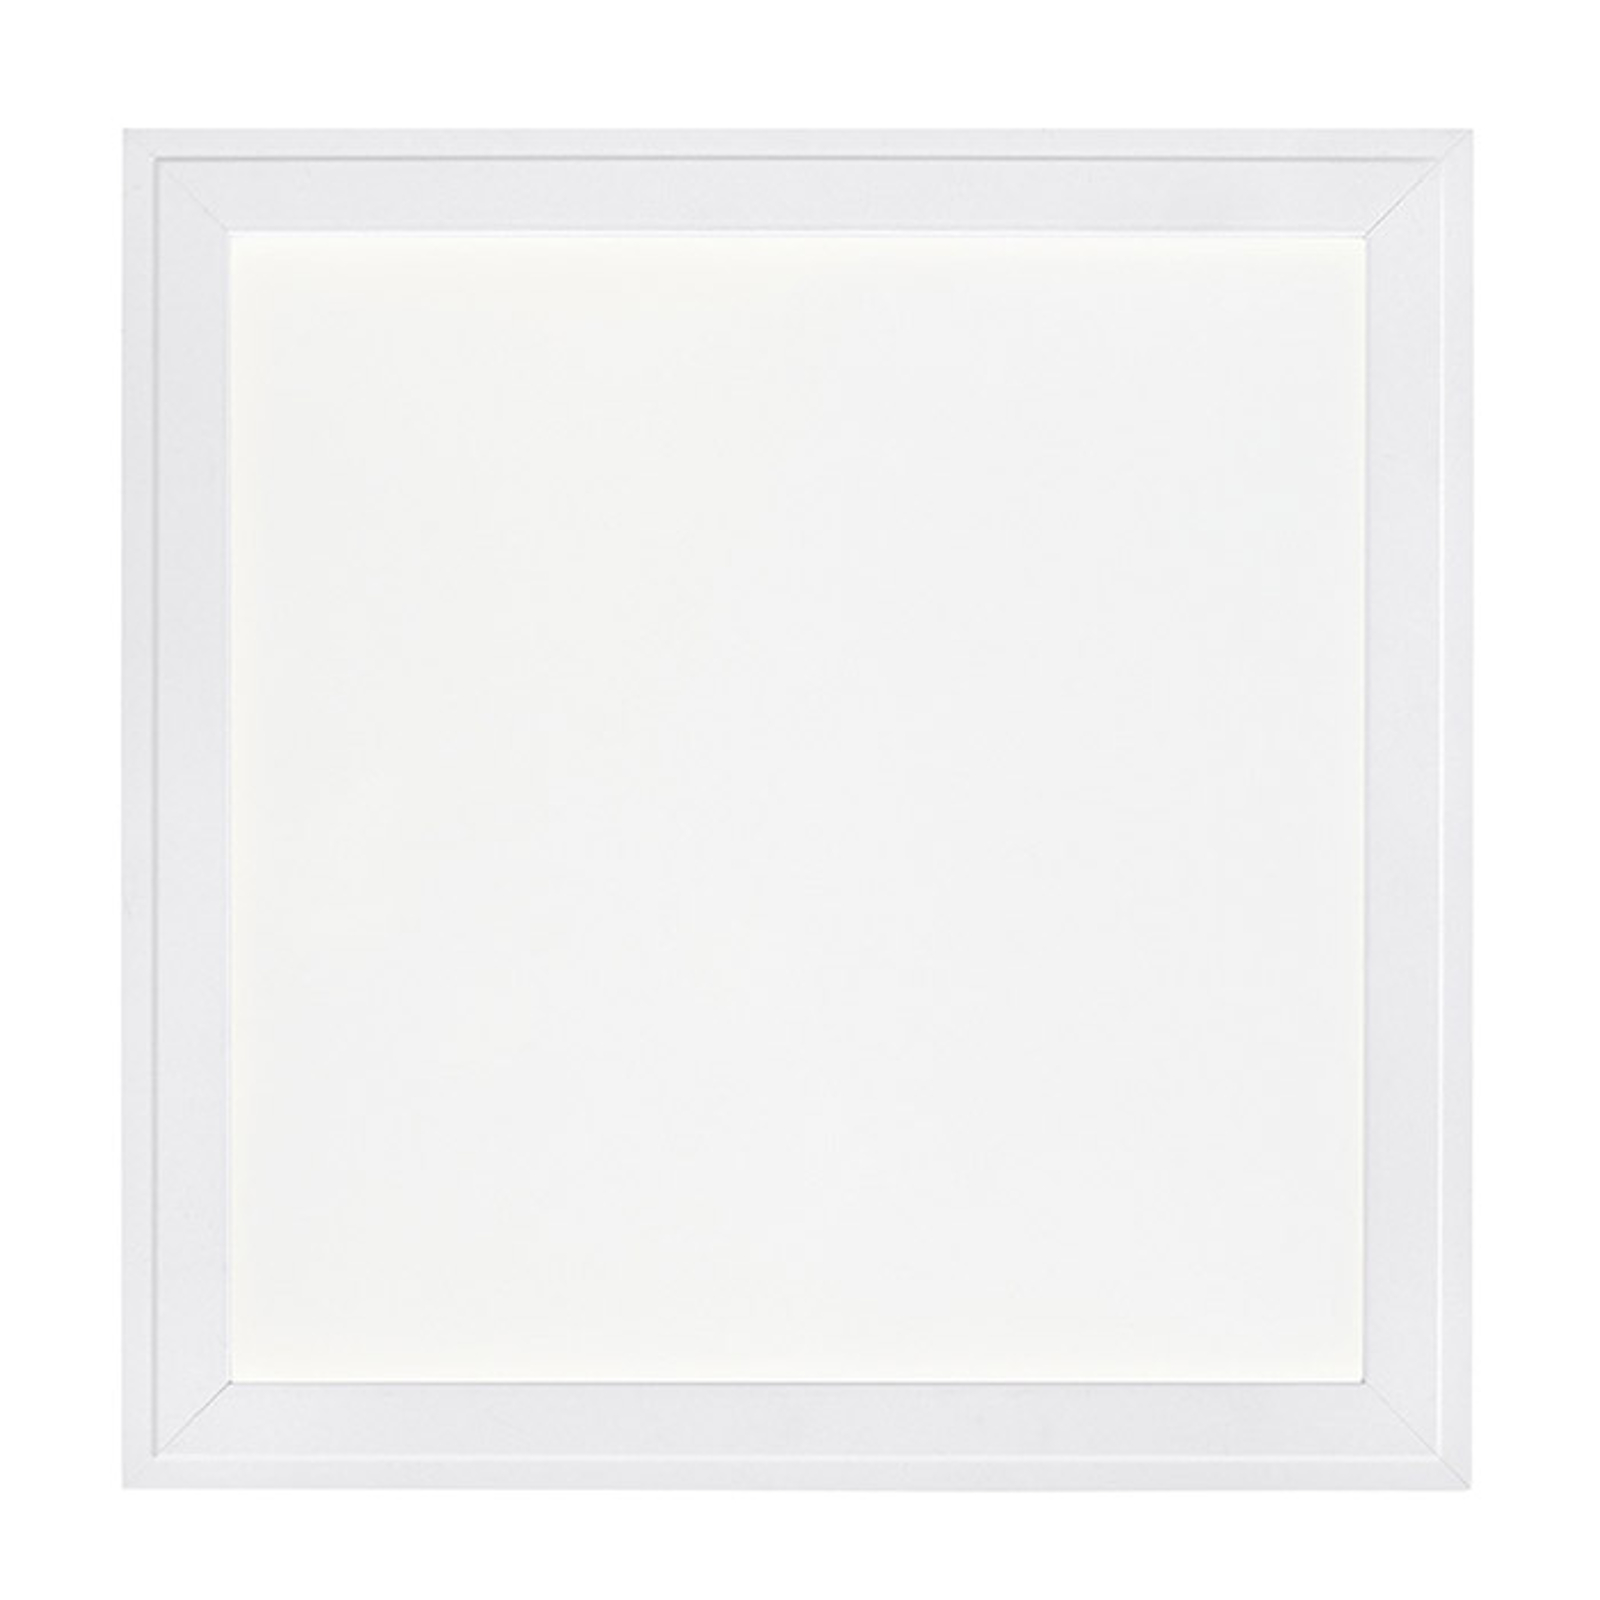 LED plafondlamp 3031-016 Piatto